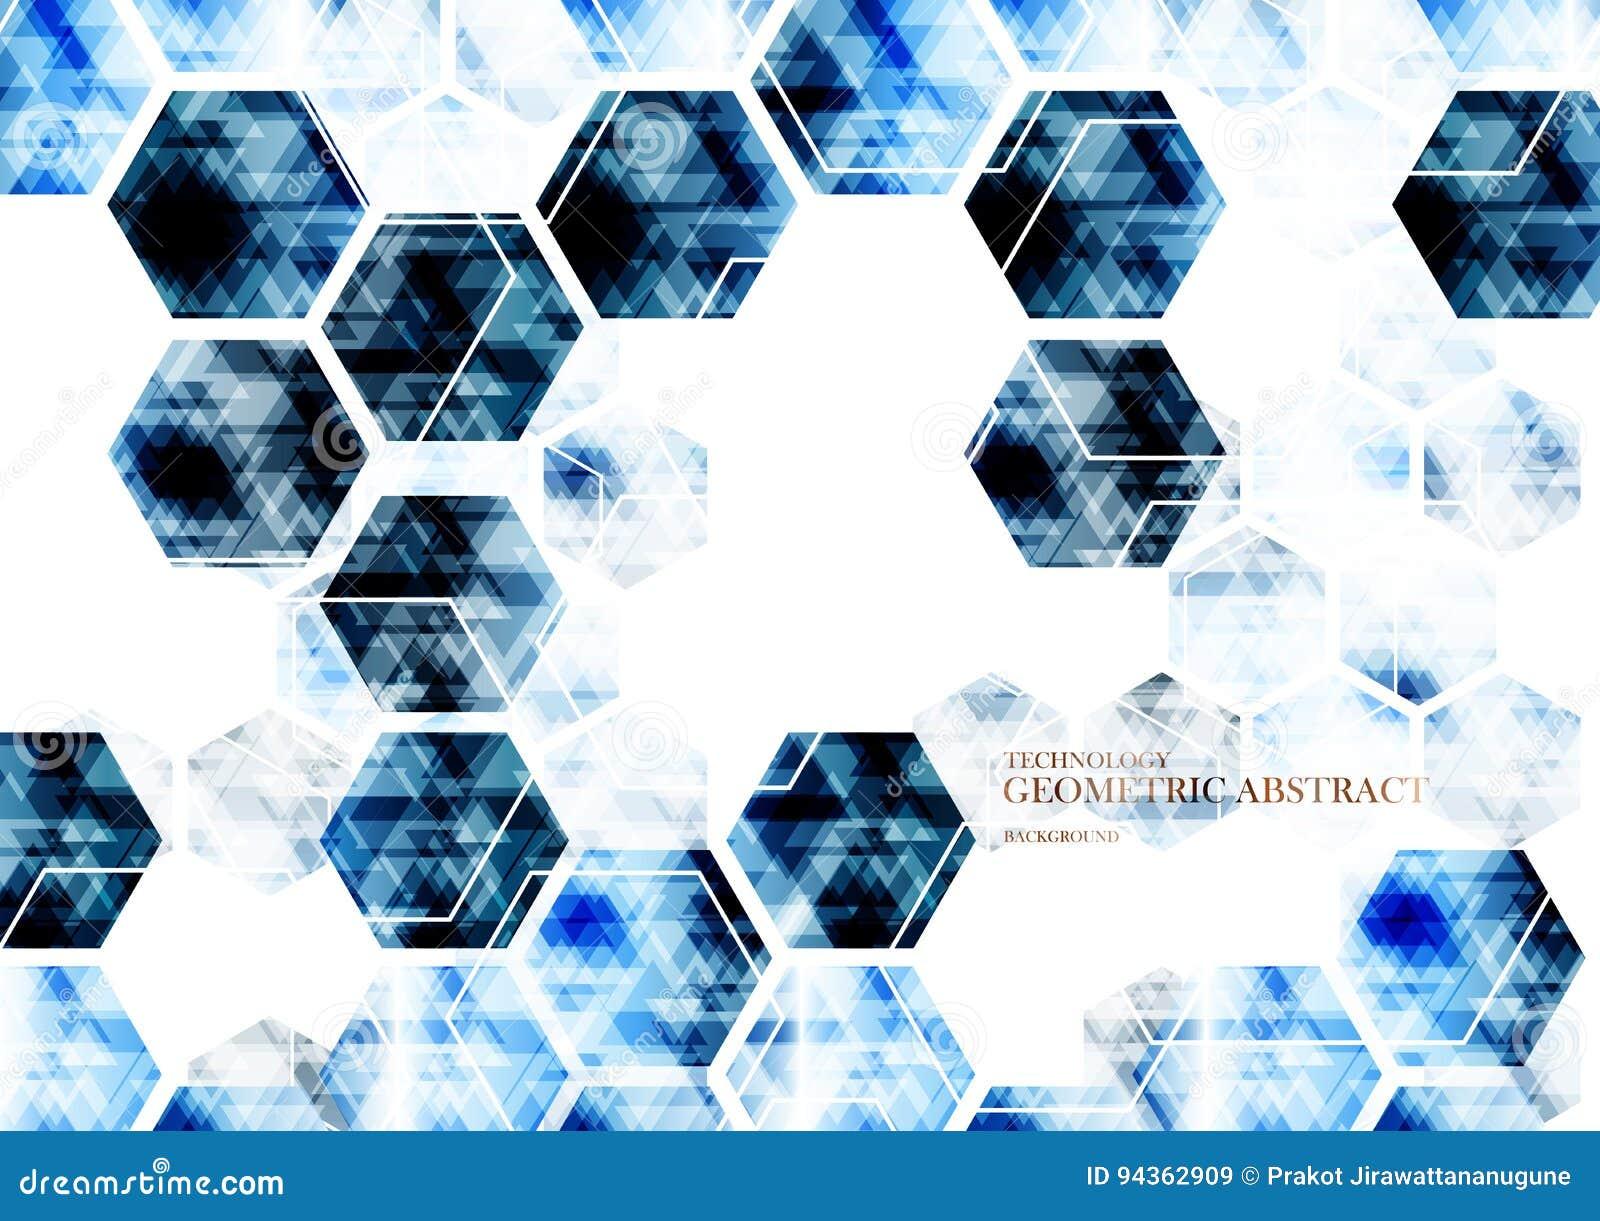 Geometric Technological Digital Abstract Modern Blue Hexagon